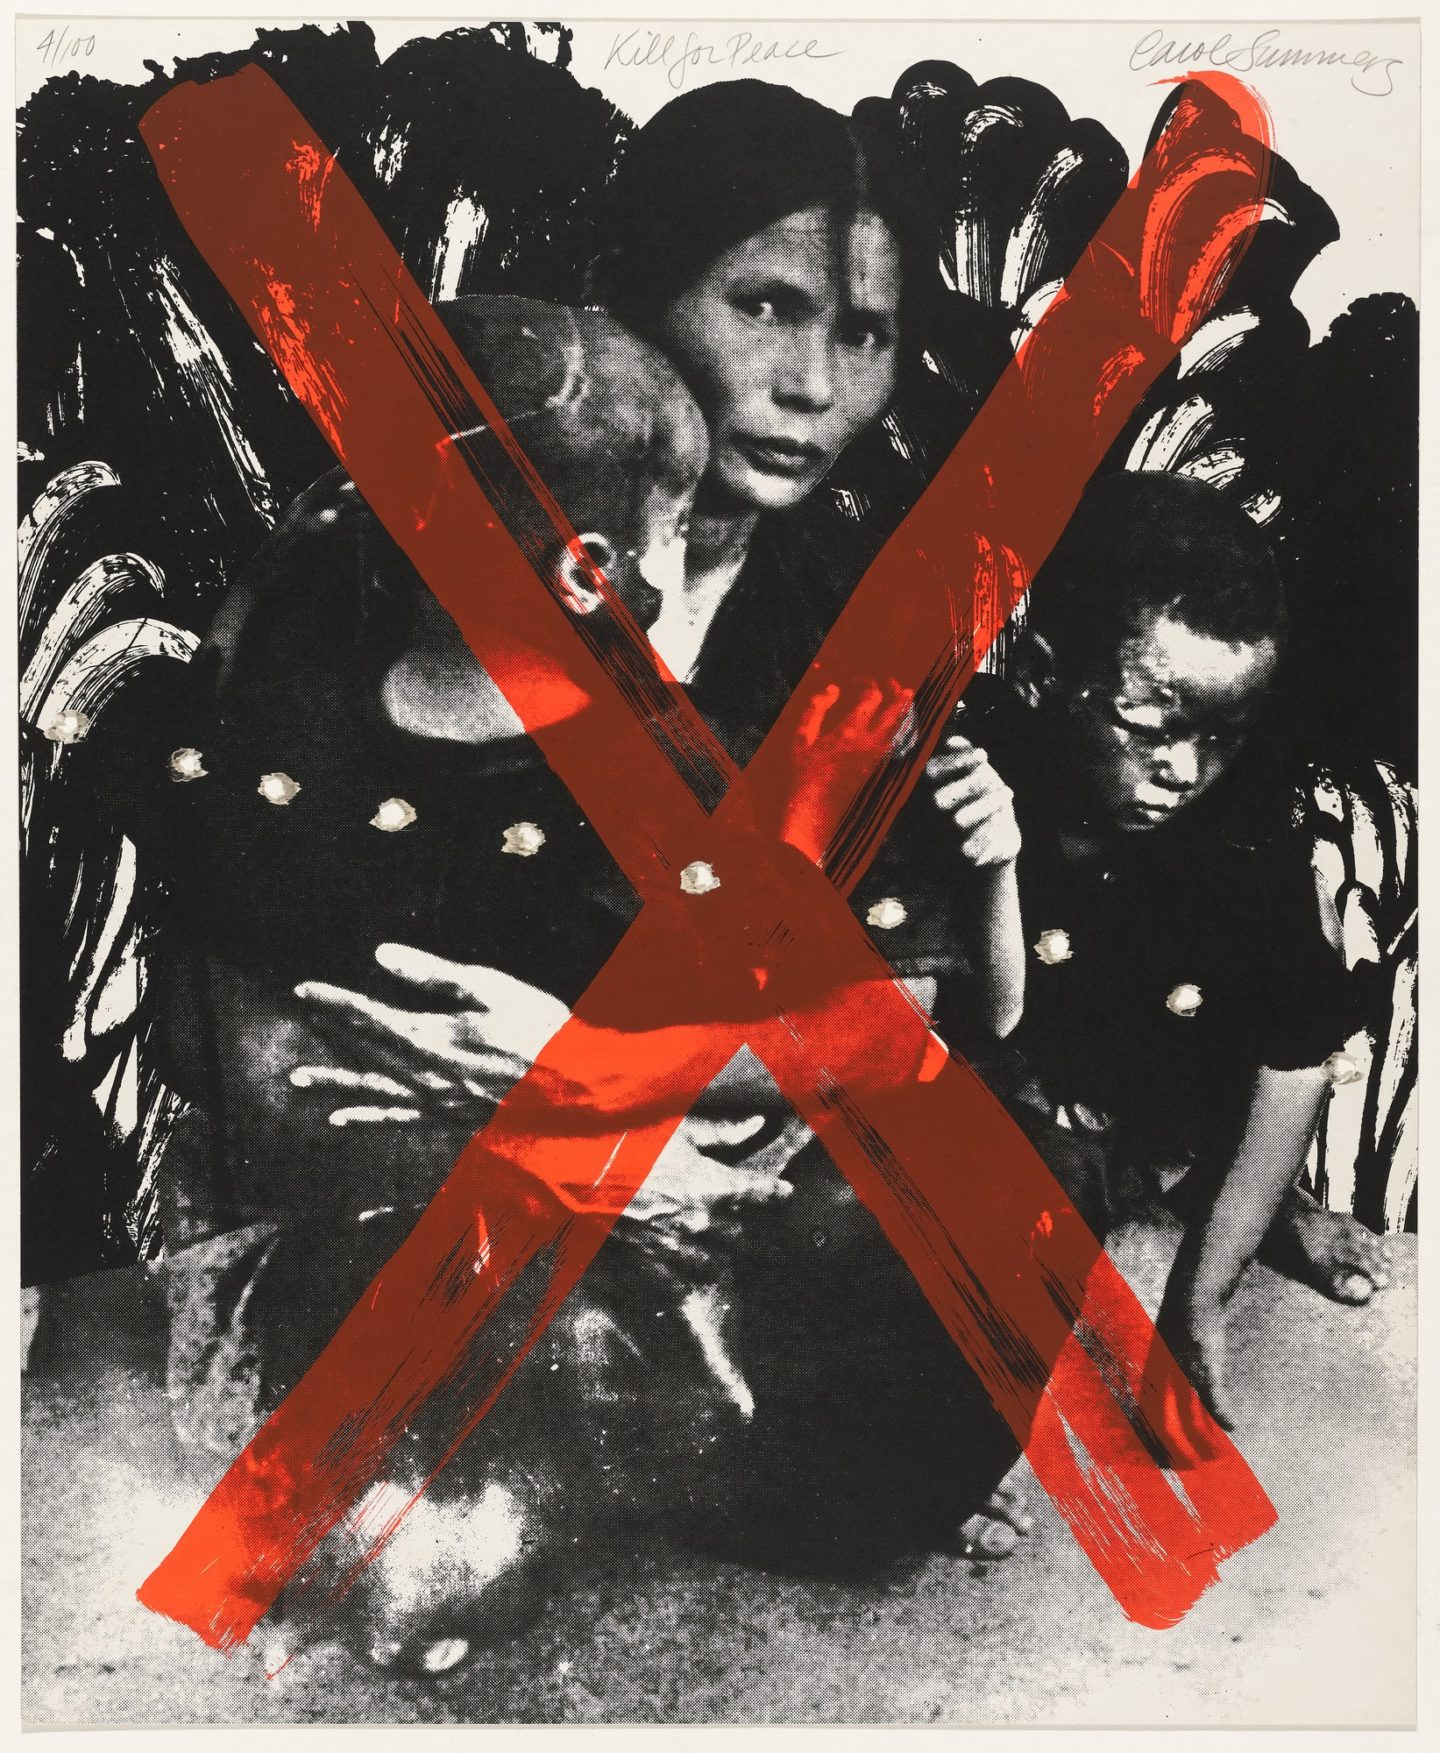 Carol Summers, Kill For Peace, 1967